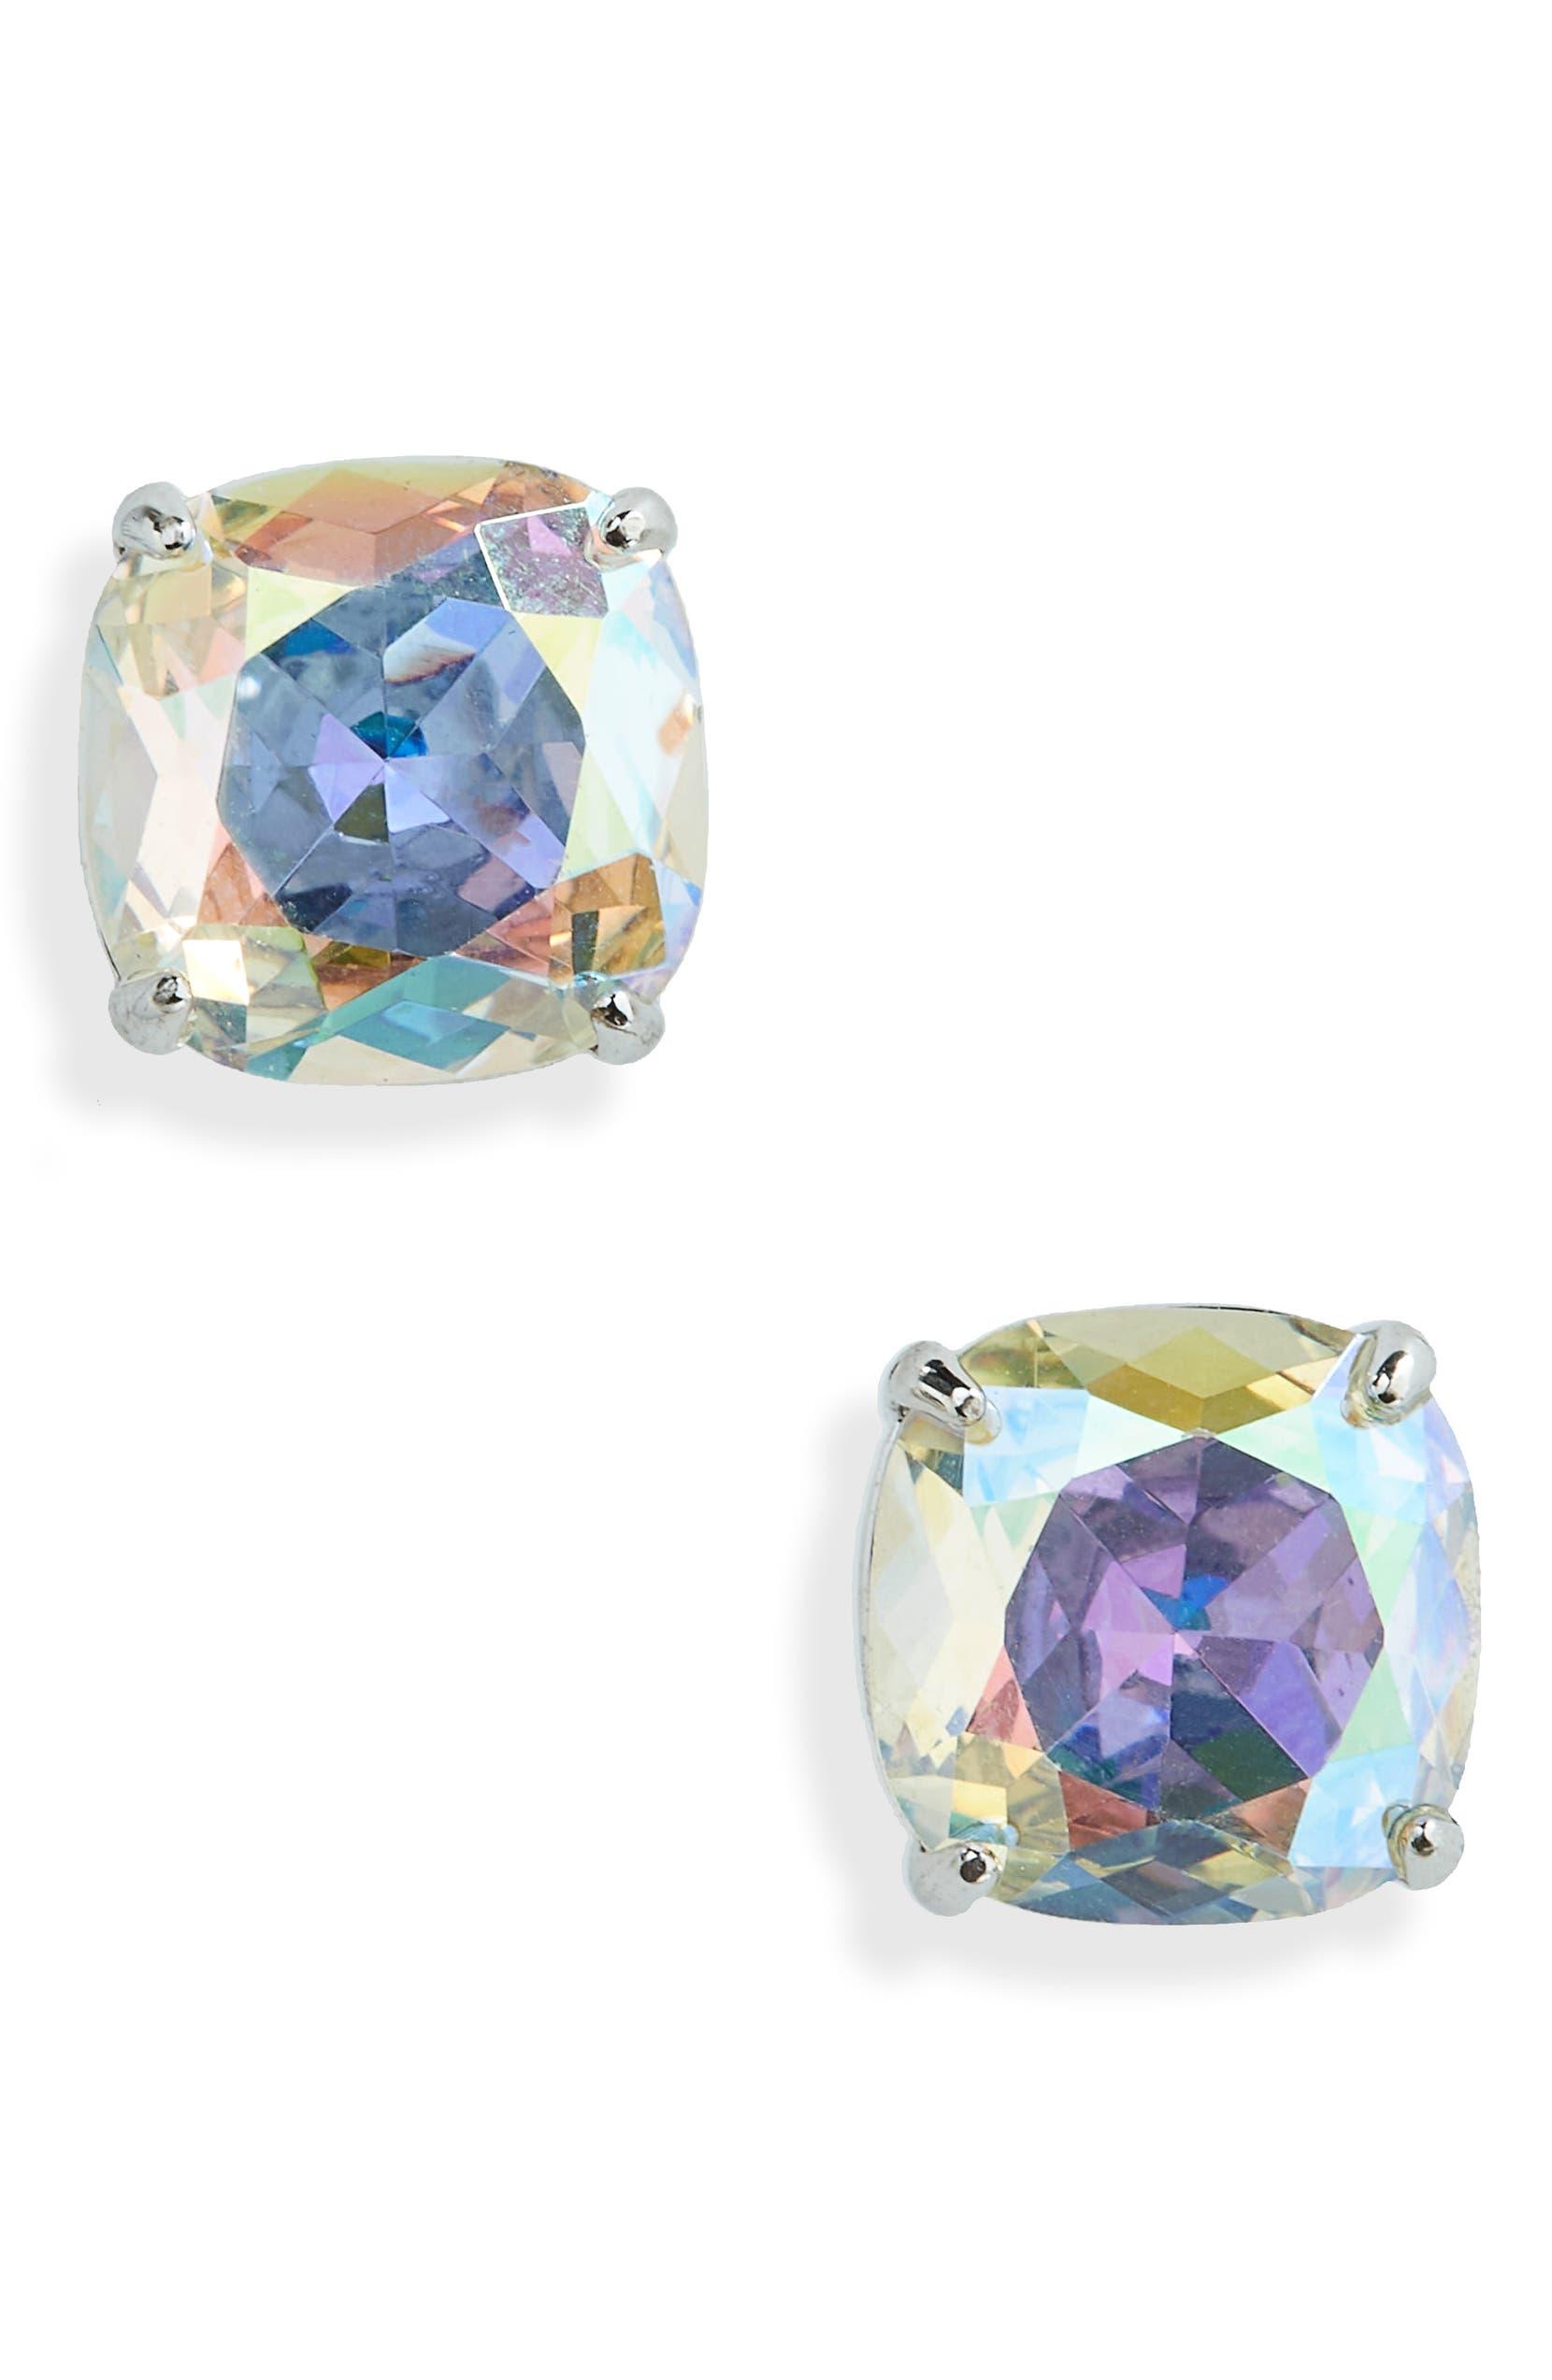 35e06449a970b mini small square semiprecious stone stud earrings